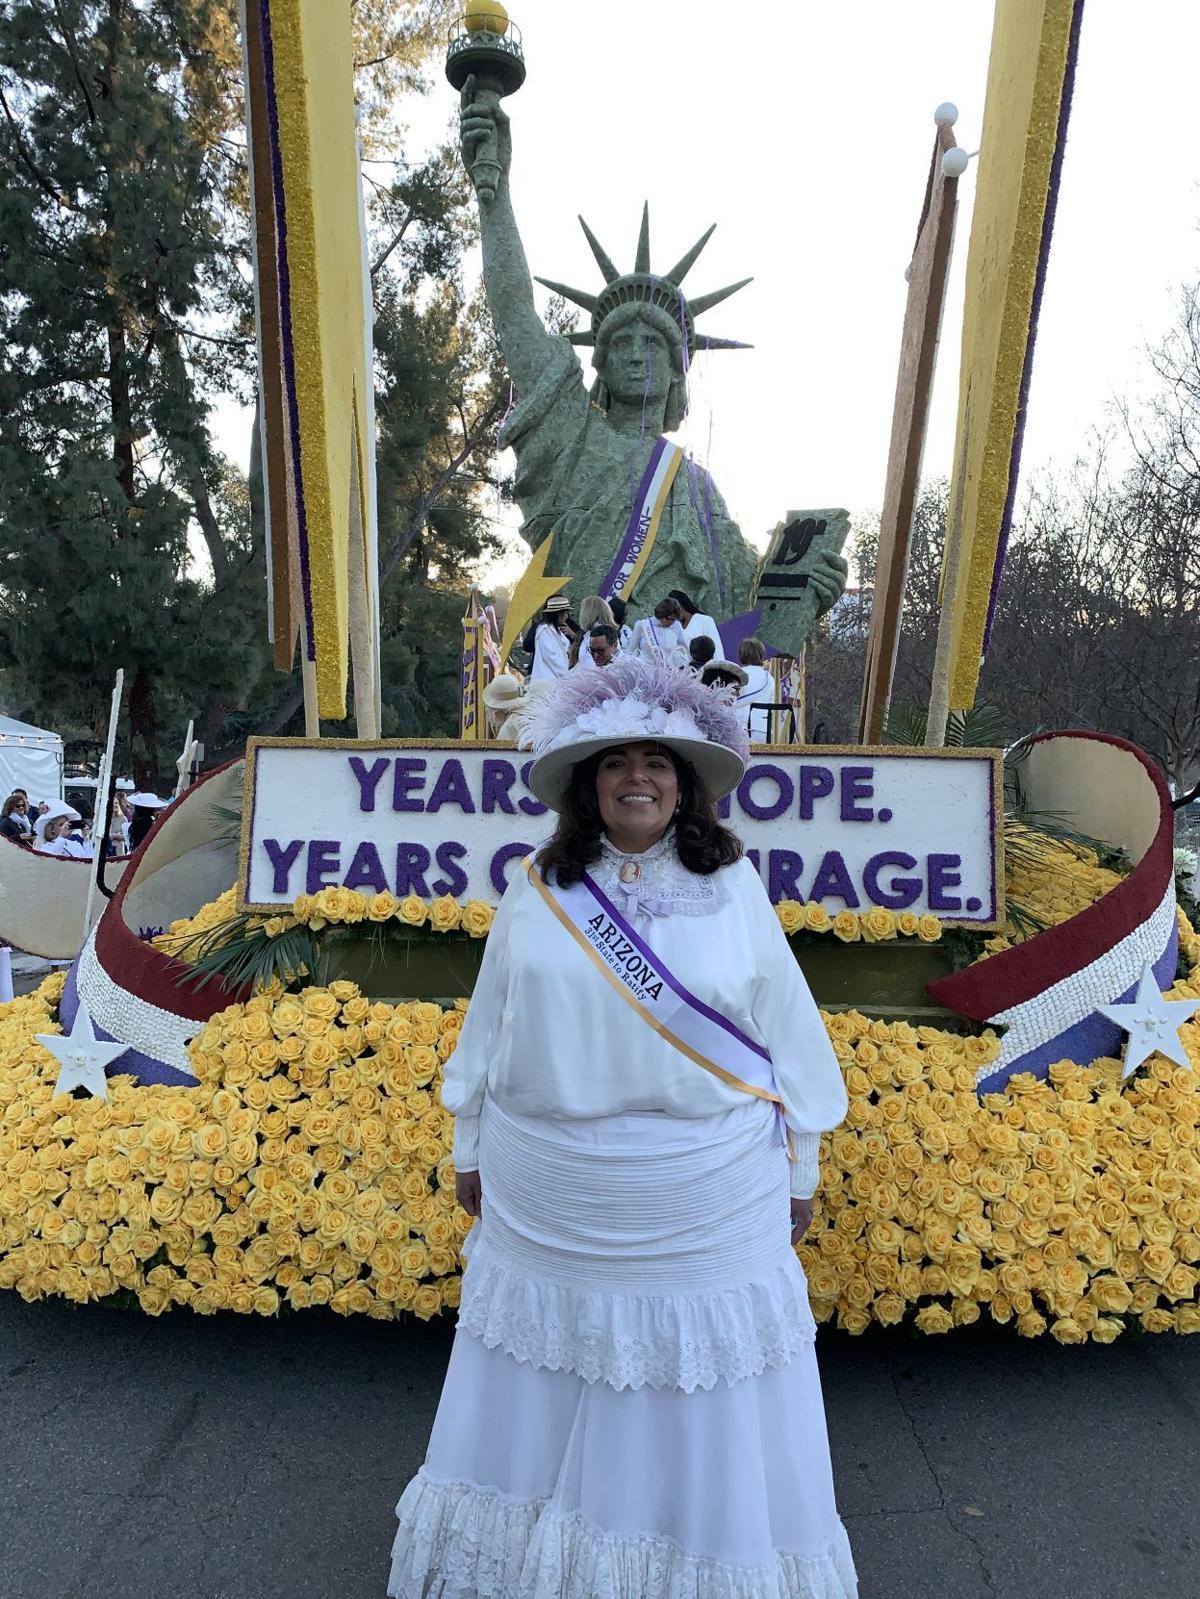 Supervisor Archuleta at the Rose Parade